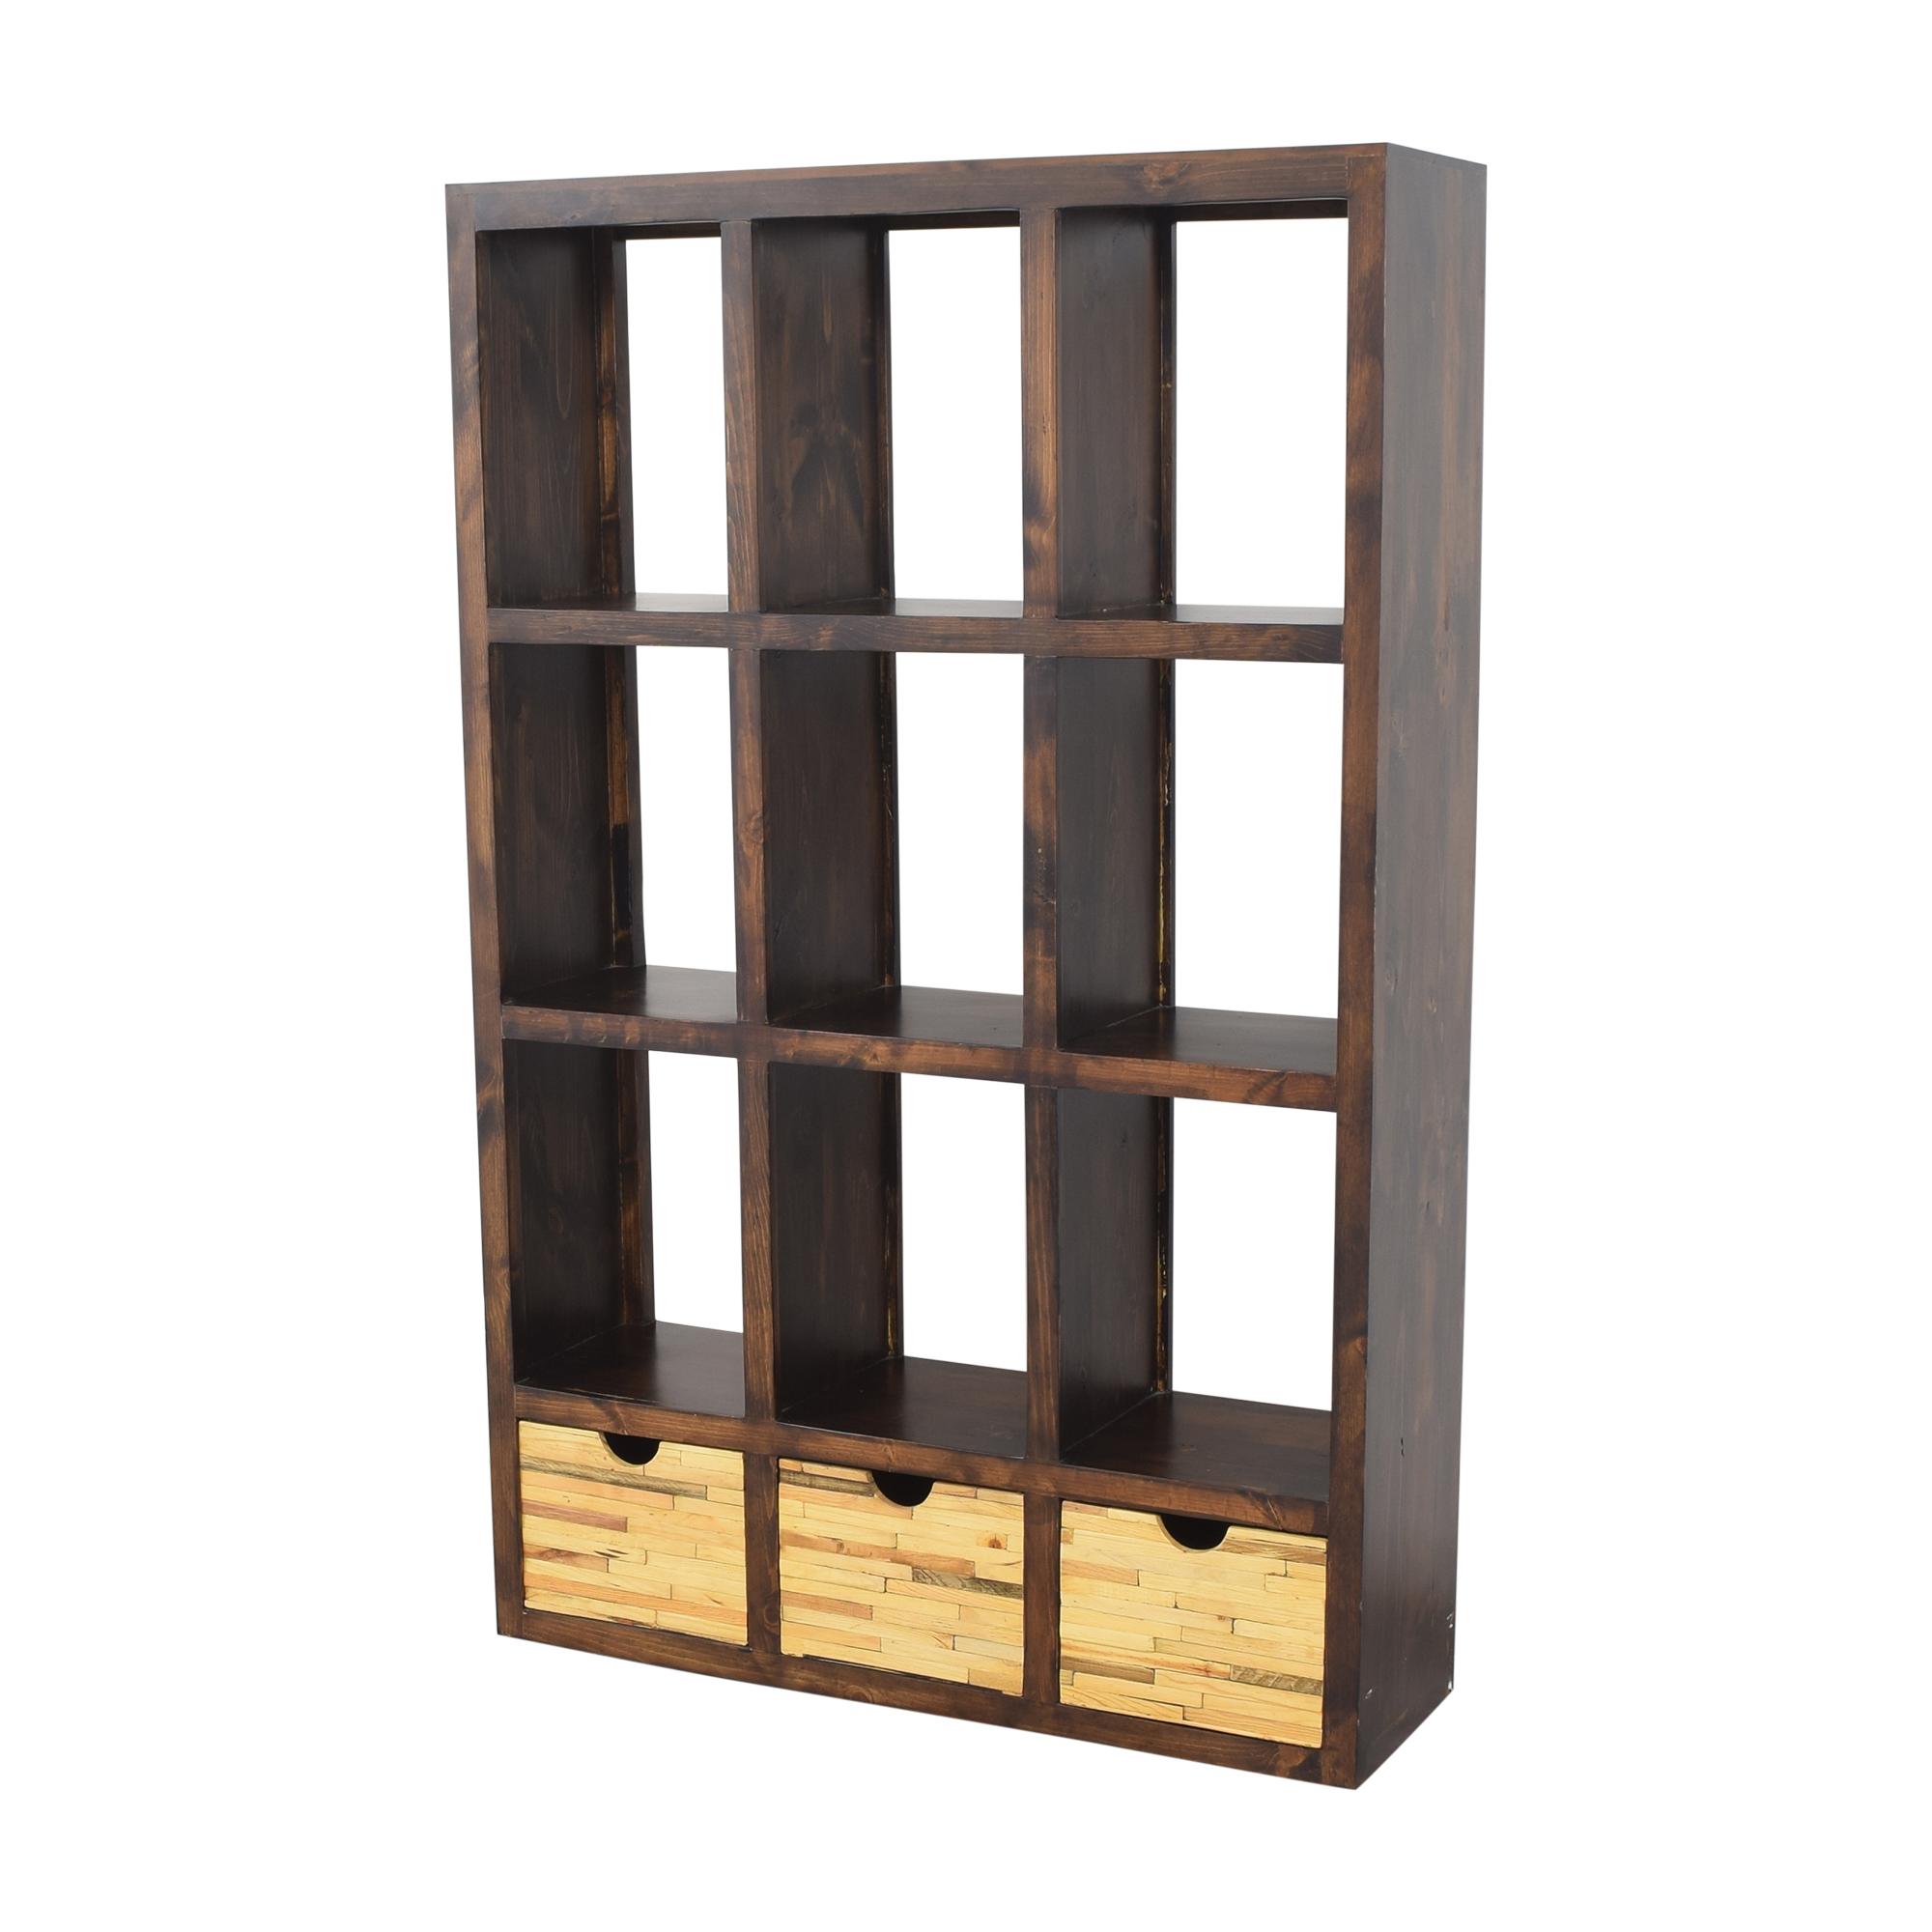 Display Bookshelf with Storage on sale